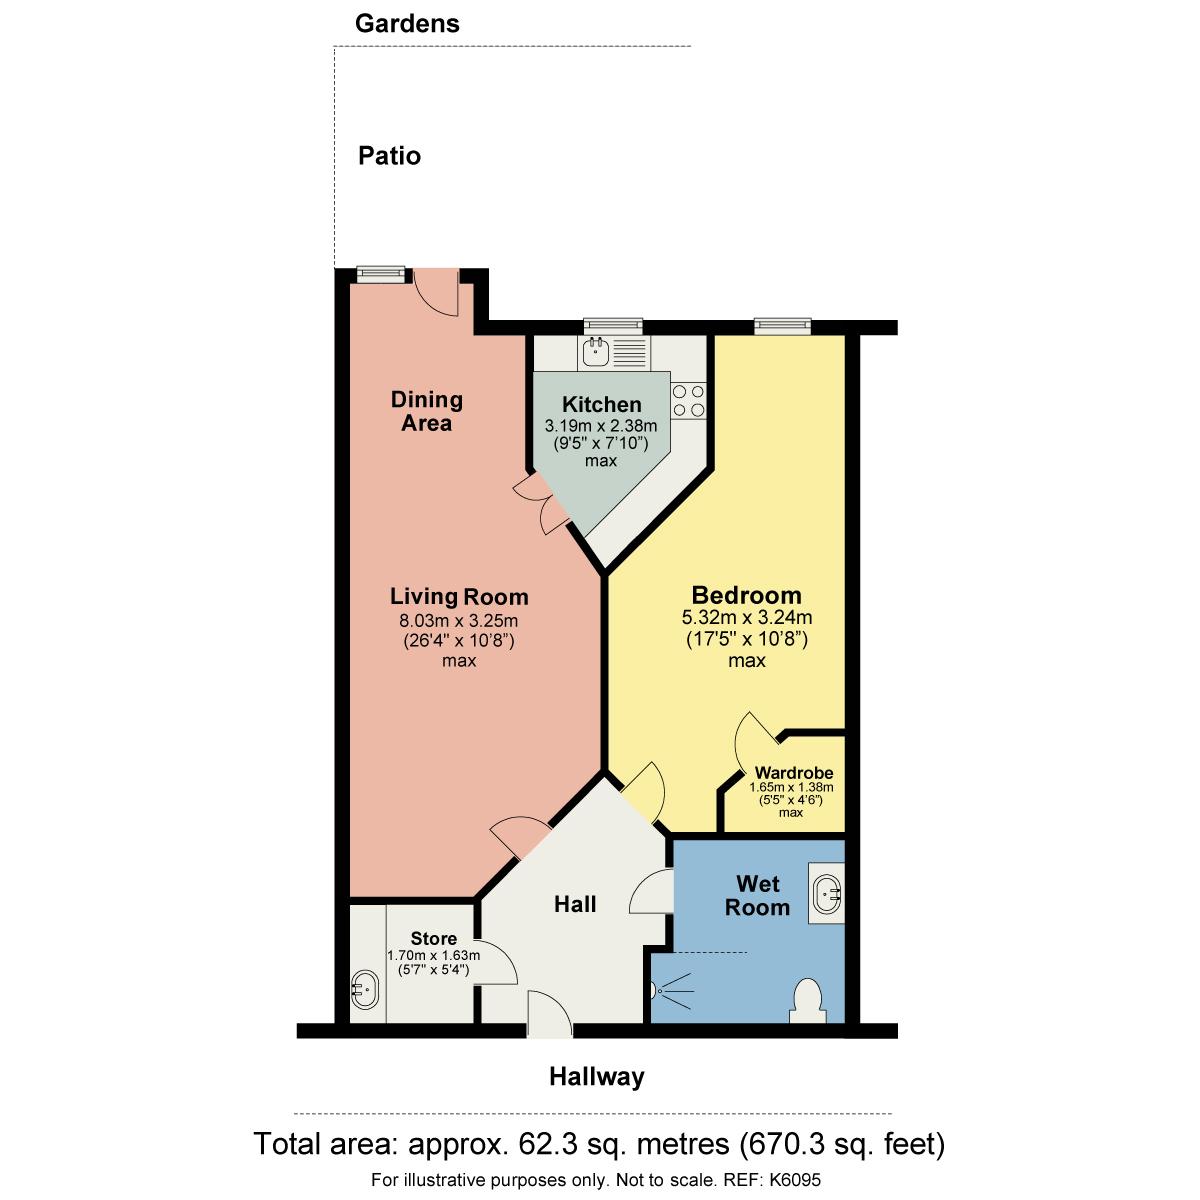 Floorplan 14 Wainwright Court, Webb View,Kendal, Cumbria, LA9 4TE